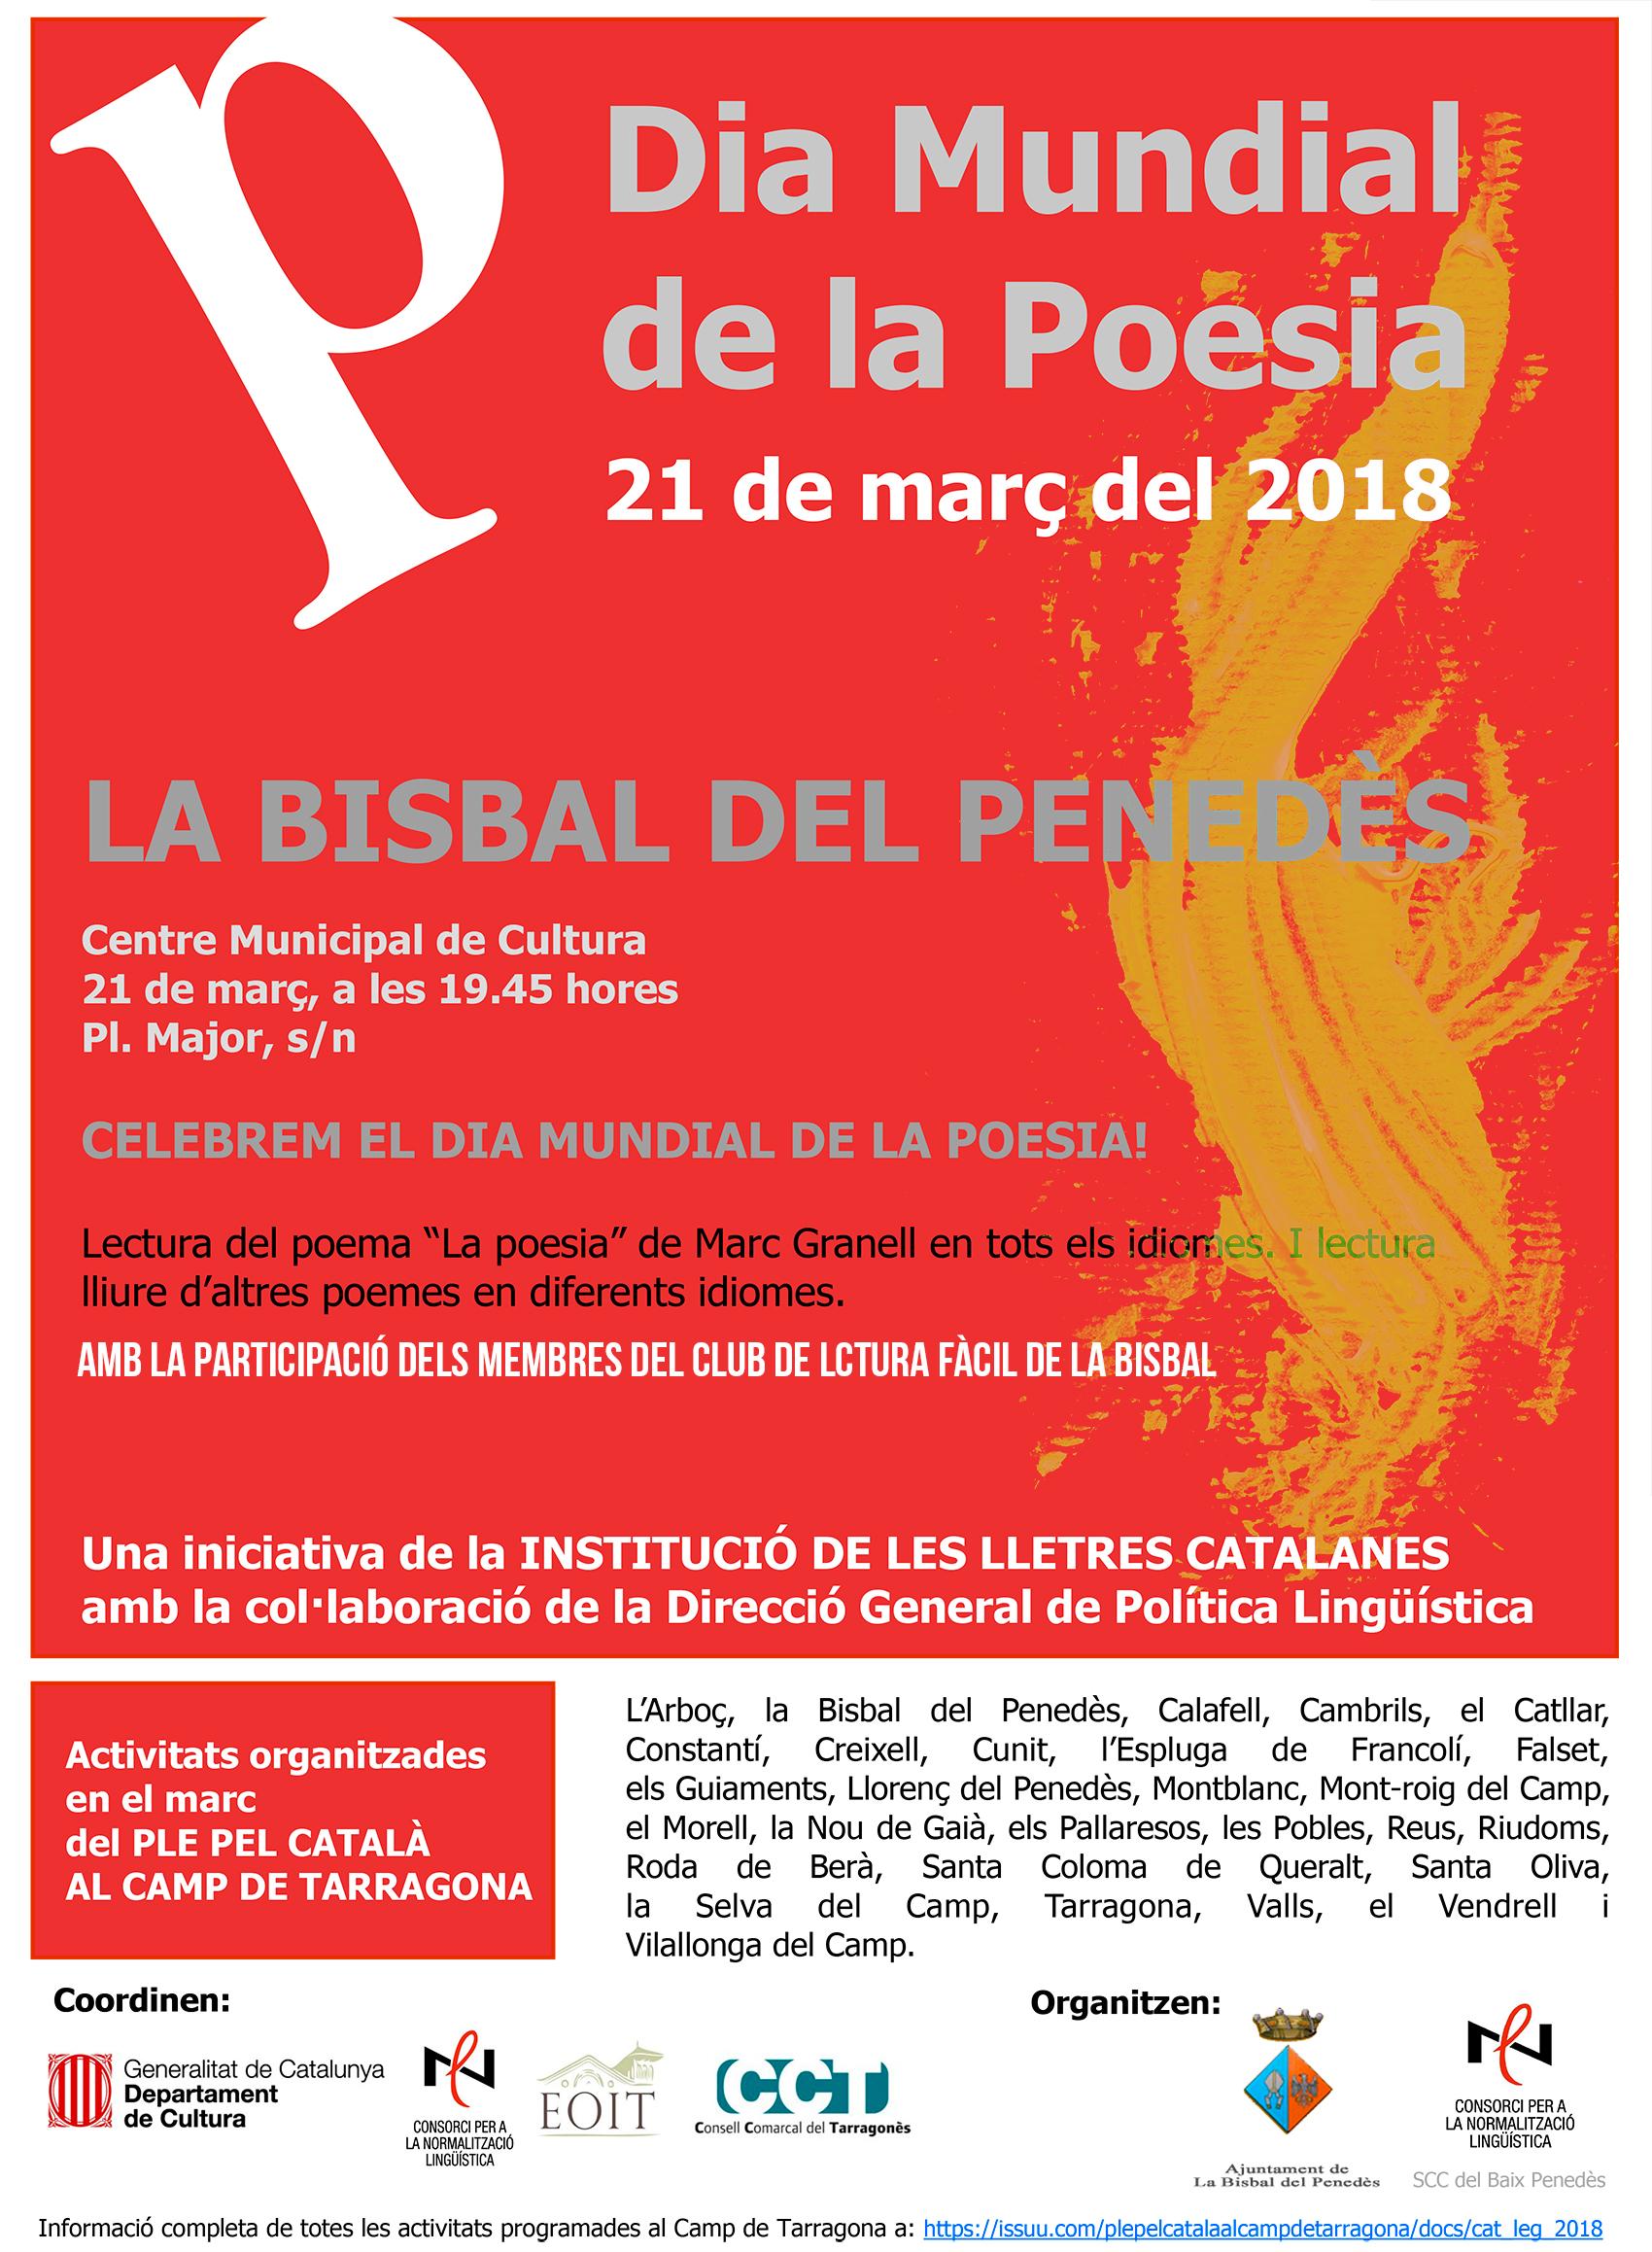 El dia 21 de març celebrarem el Dia Mundial de la Poesia